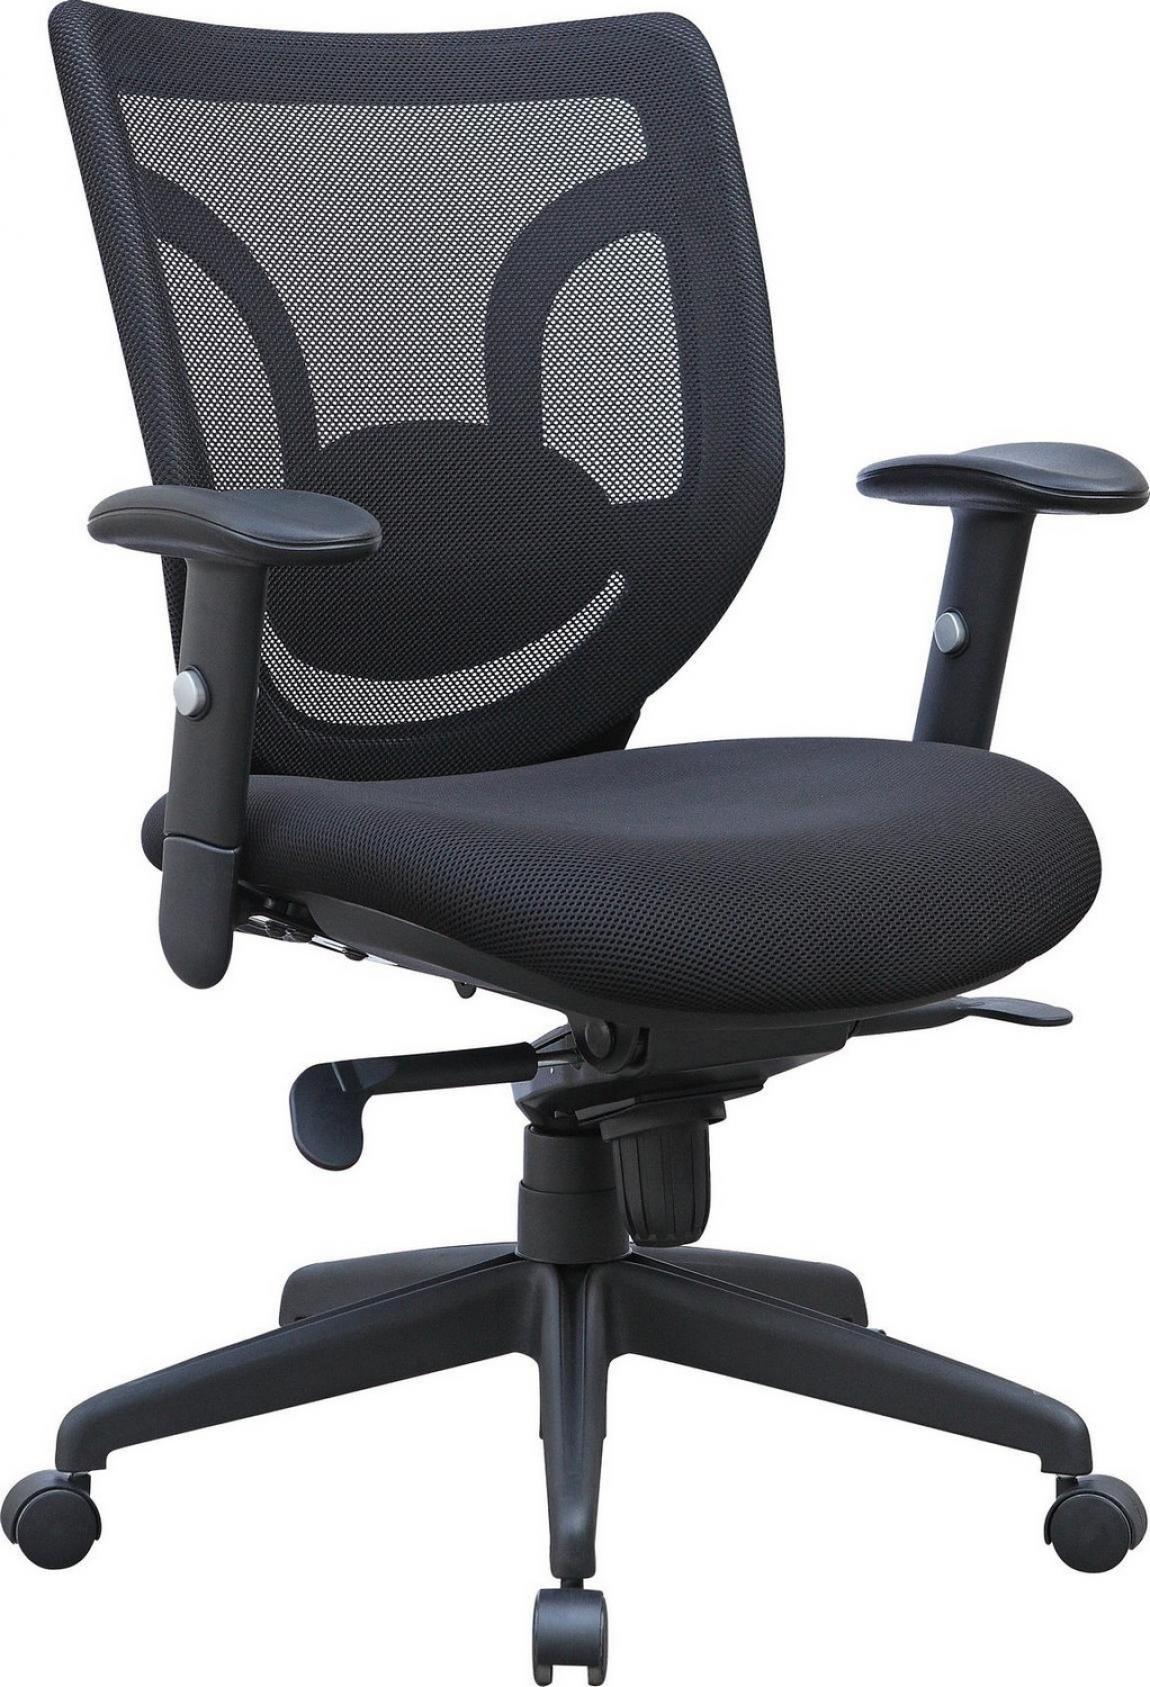 Mesh Stuhl Unterstützt Den Rücken   Stuhlede.com   Stühle ...